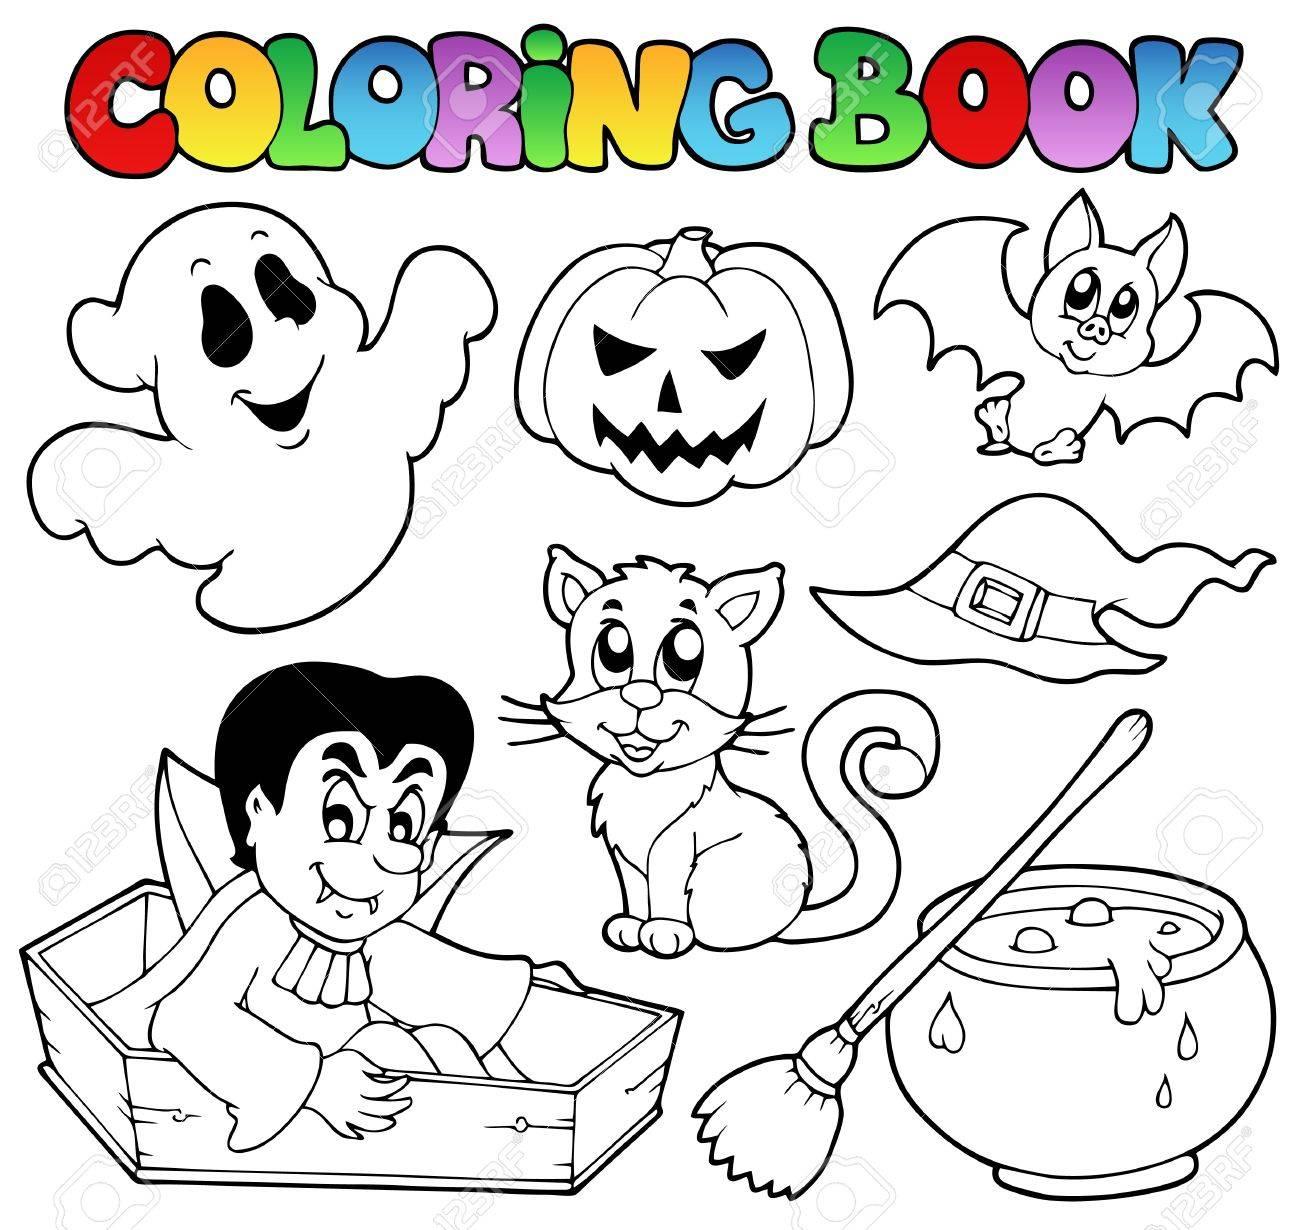 Coloring Book Halloween Cartoons 1 - Vector Illustration. Royalty ...